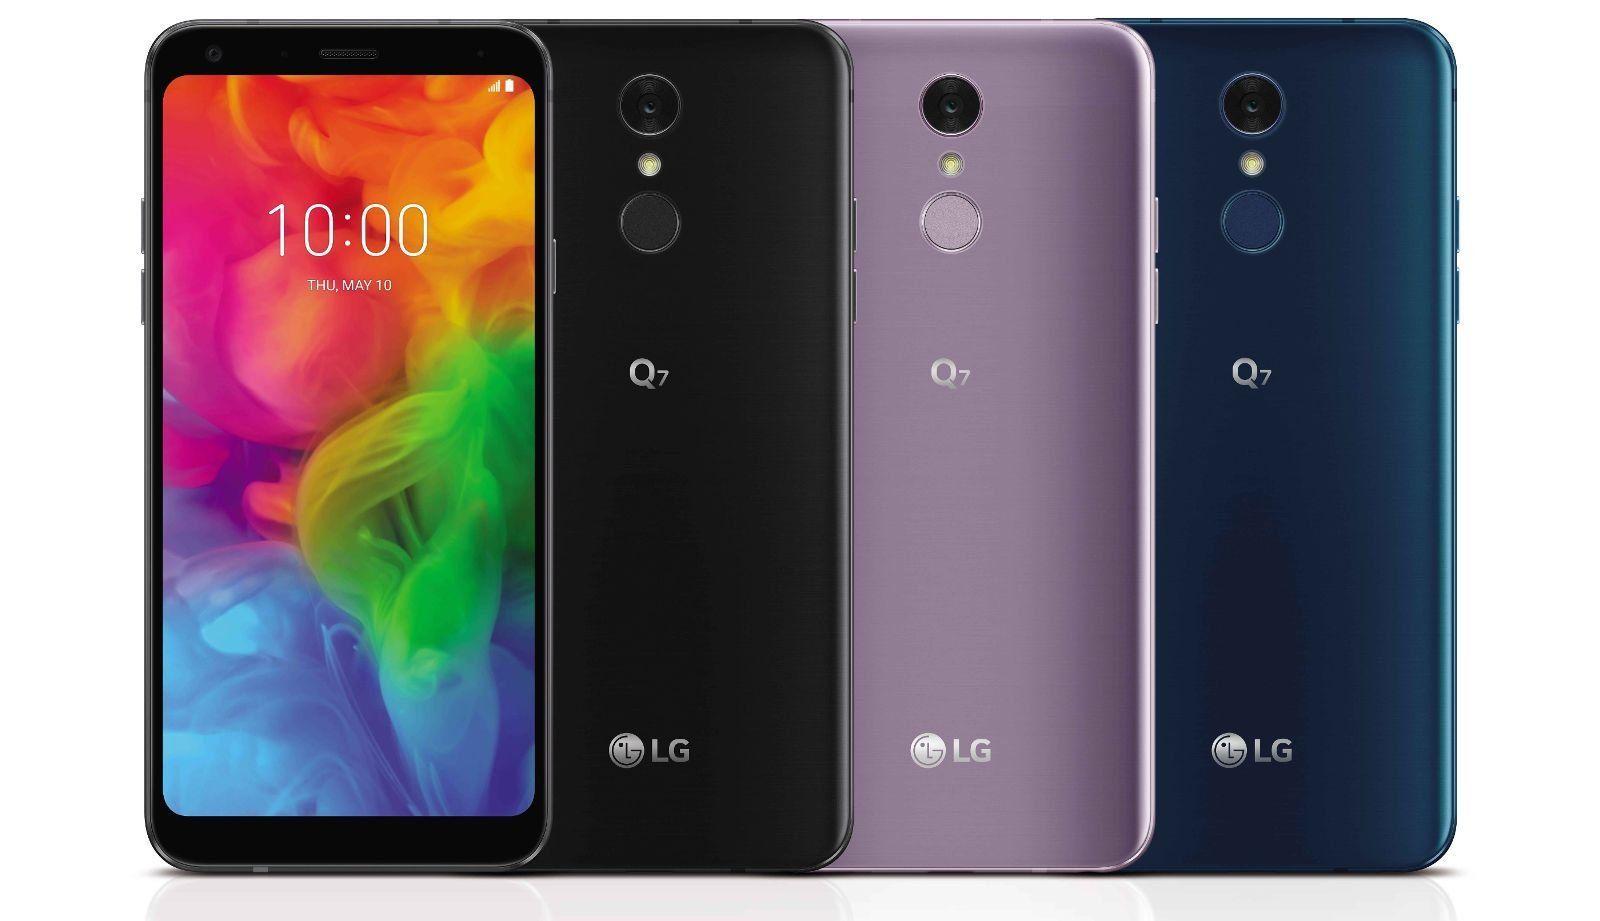 Prednosti i nedostaci pametnih telefona LG Q7 + i Q7 - novi proizvodi 2018. godine